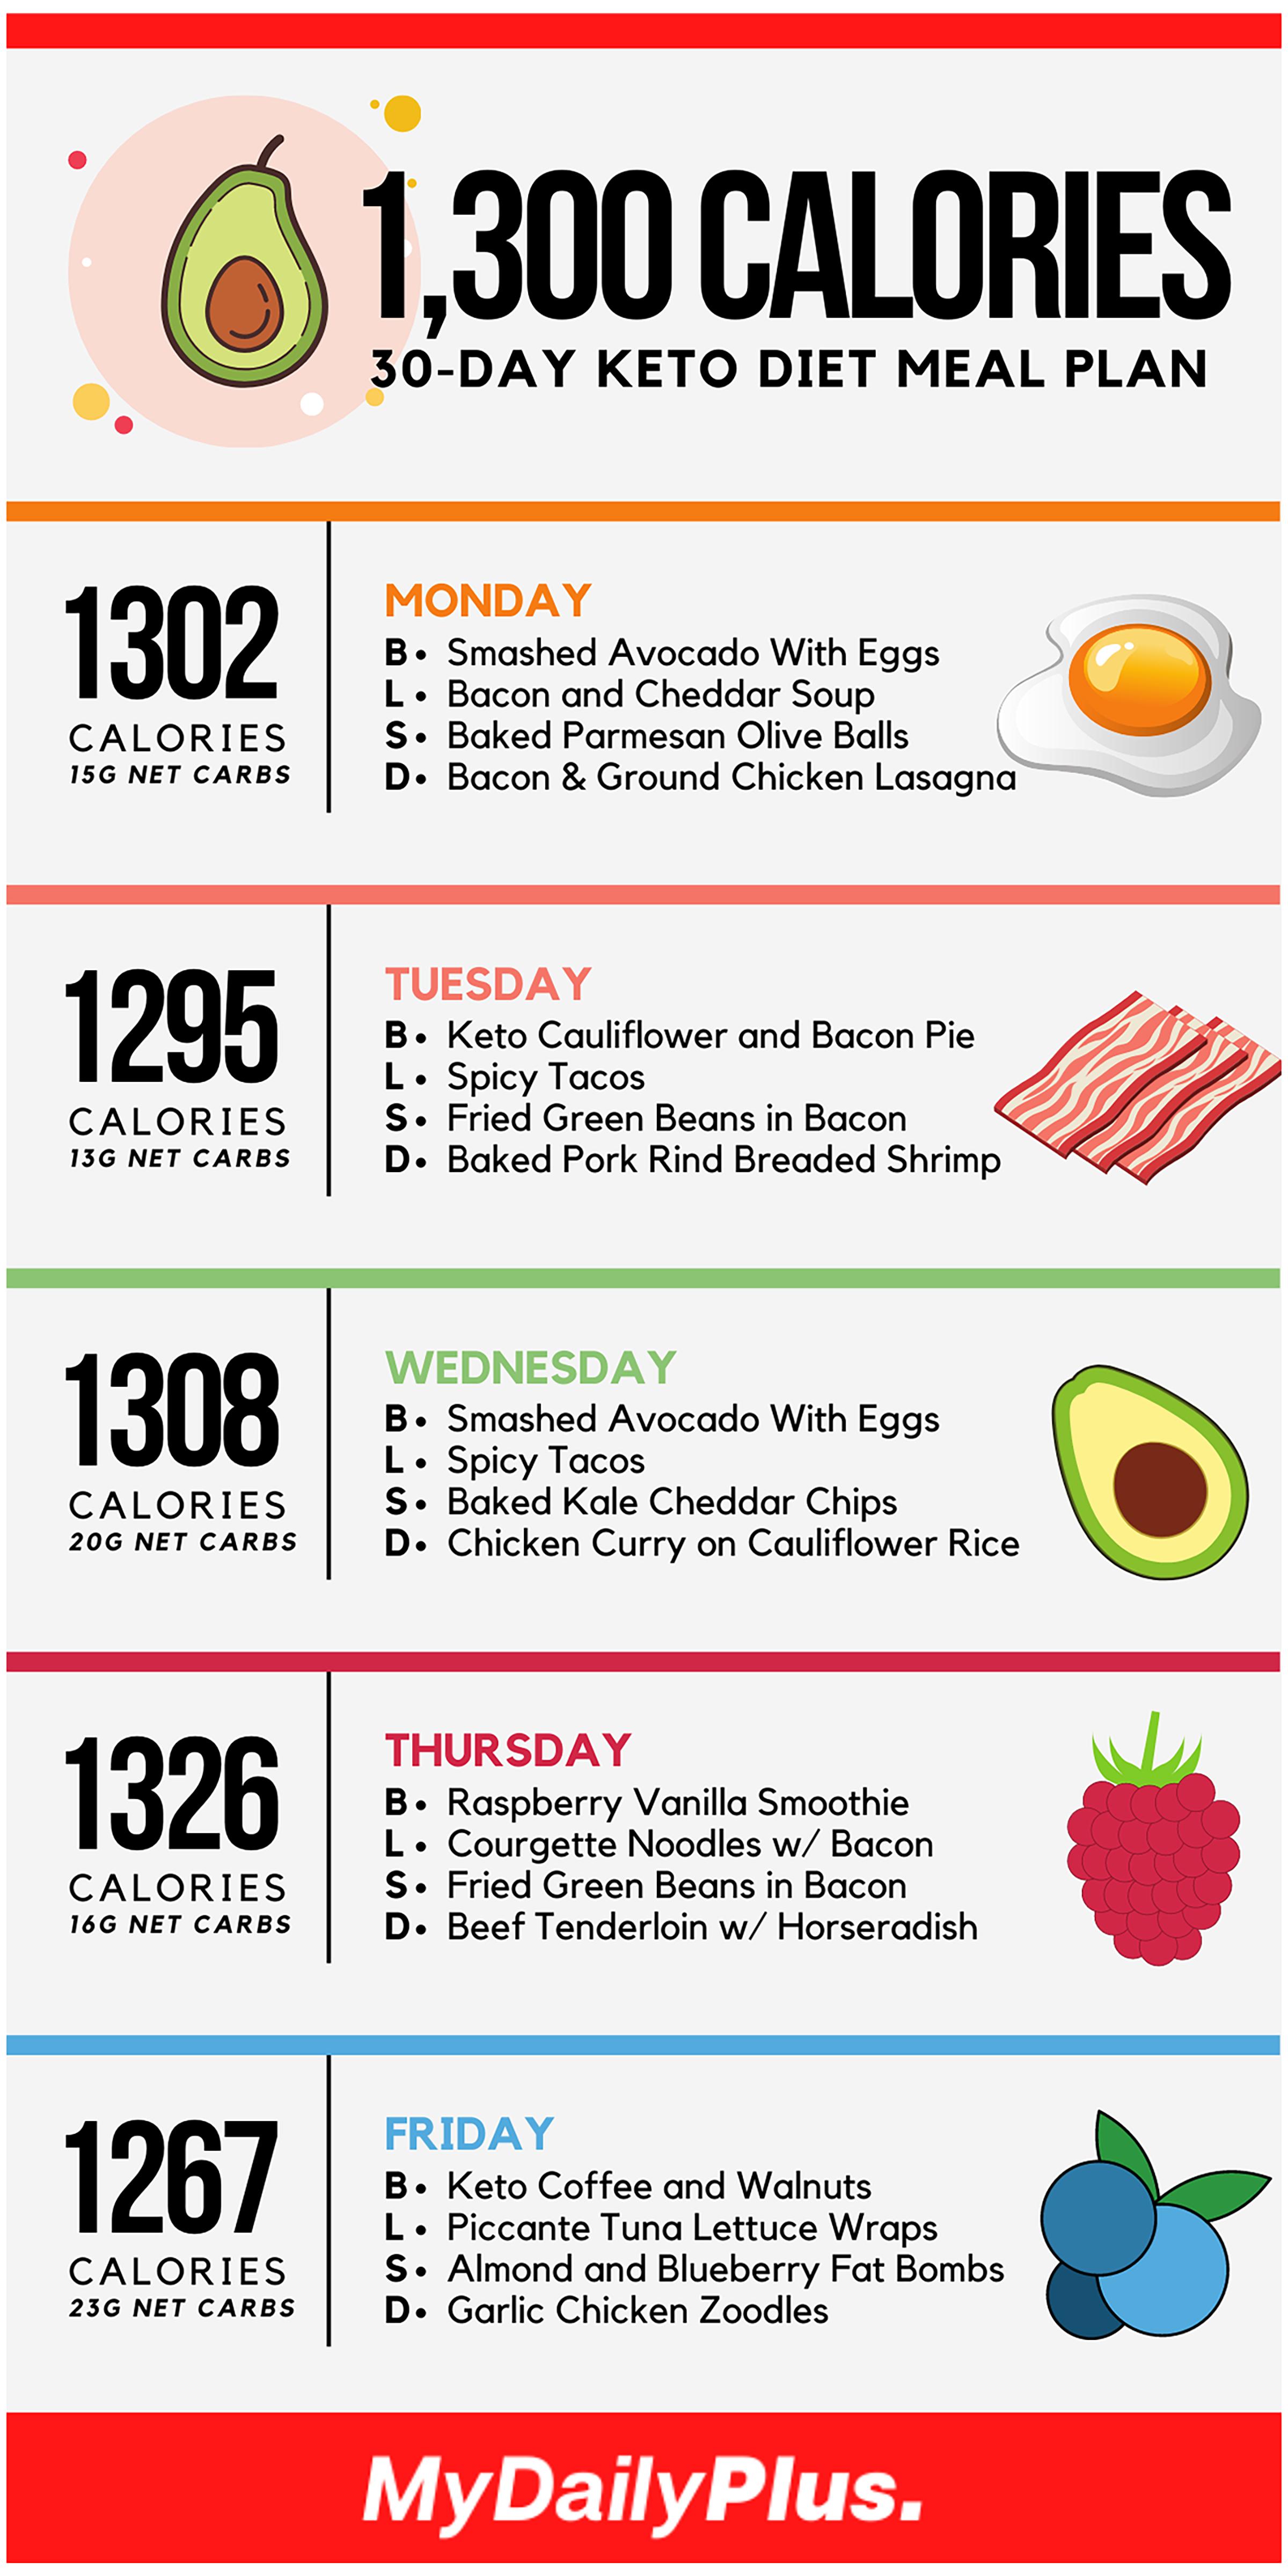 Keto Diet Menu: 30-Day Keto Meal Plan for Beginners